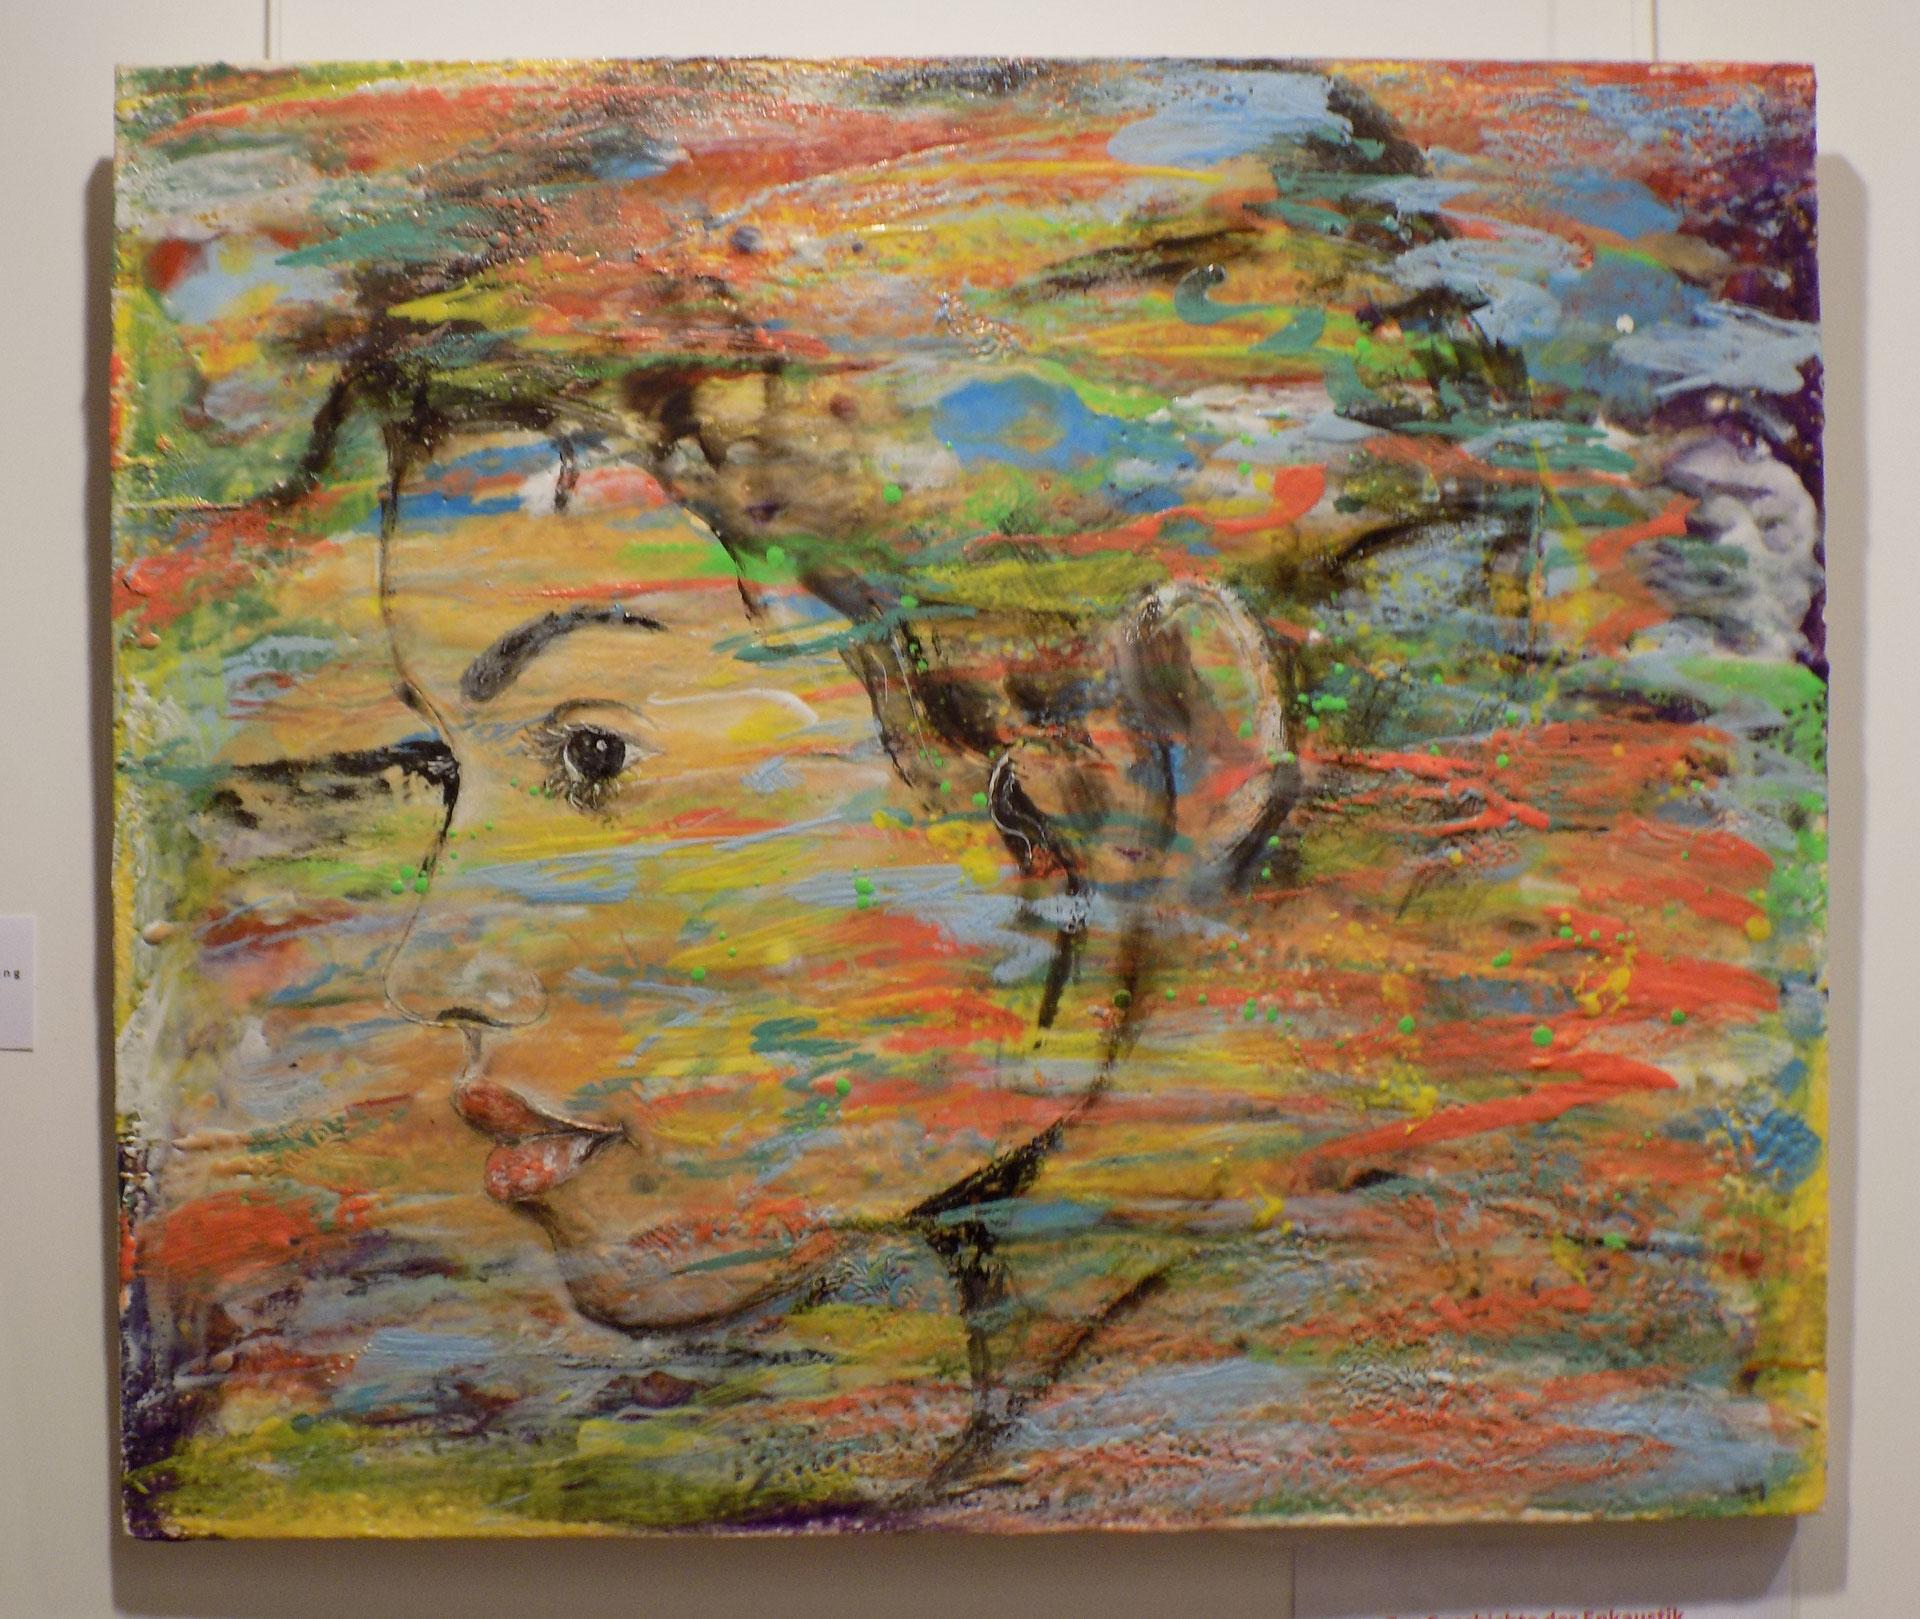 Enkaustik Wachsmalerei Portrait Malerei Moderne Art Kunst Abstrakt Ooak Baby Kunstlerpuppe Modellierte Ton Skulpturen Als Auftragsarbeiten Angelika Hassenpflug Fertigt Skulpturen Als Unikate Exclusive Detailgetreue Ooak Baby Puppen Kunstlerpuppen